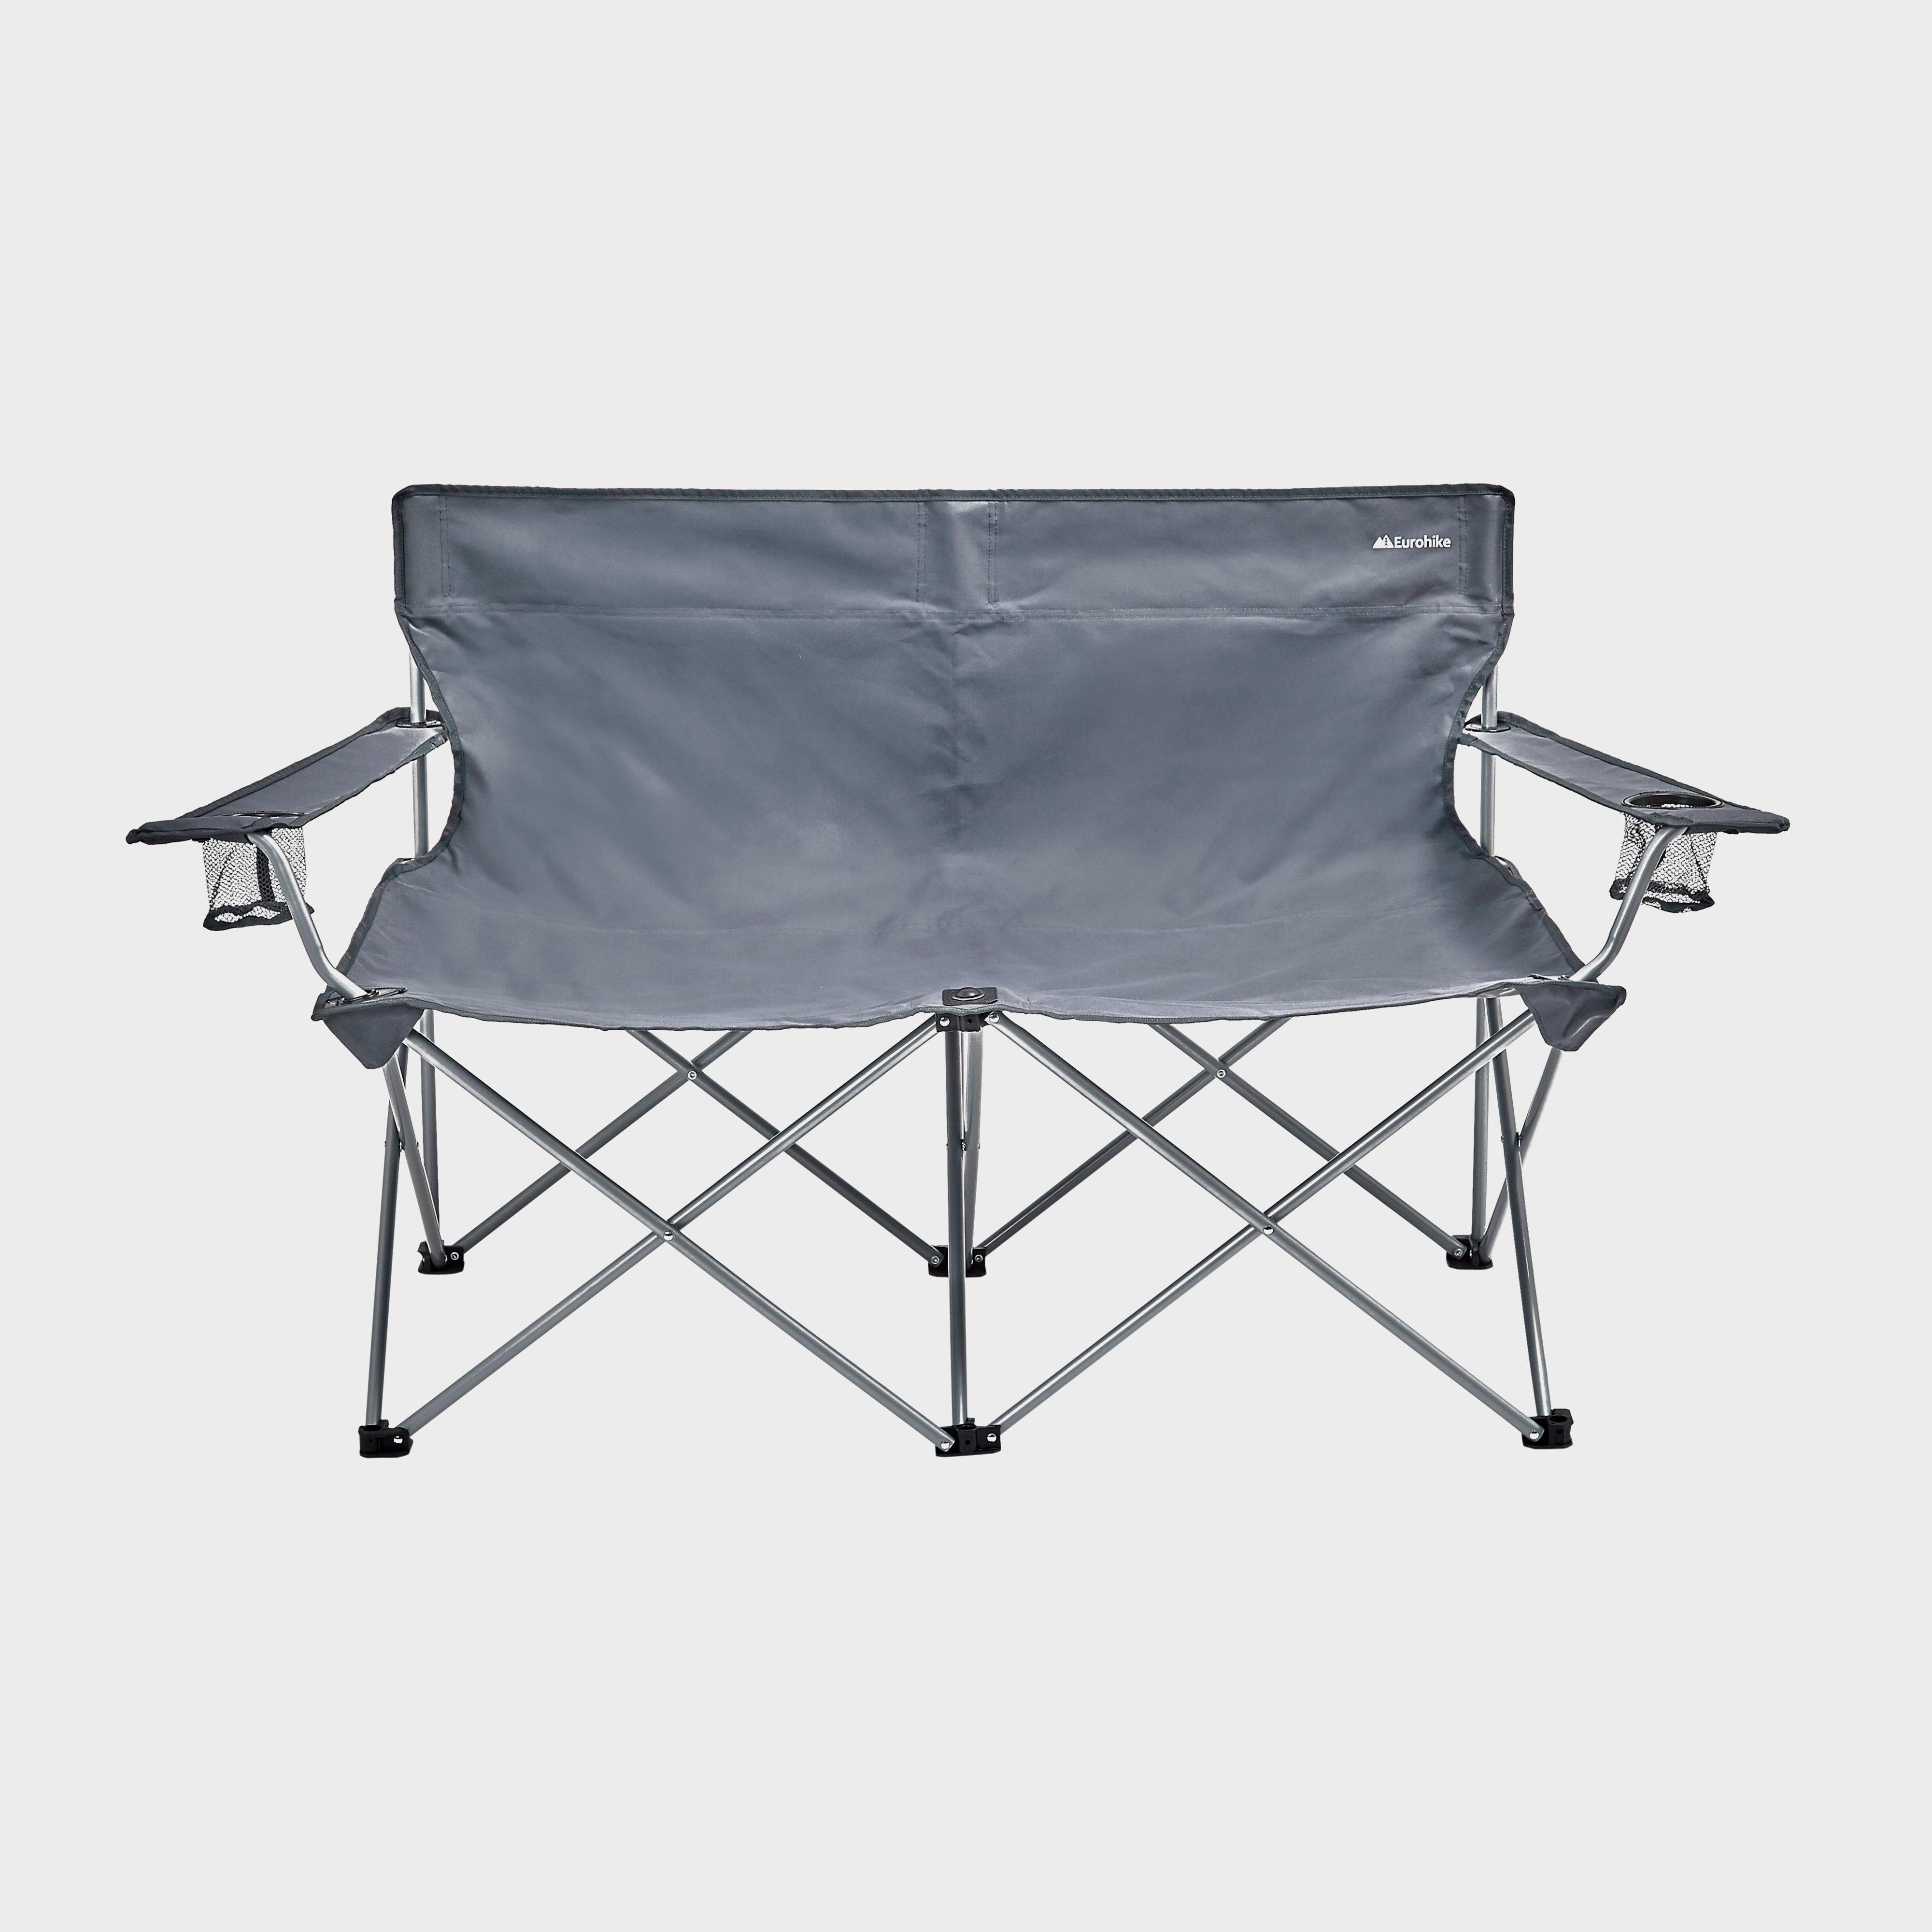 Eurohike Eurohike Peak Double Chair - Grey, Grey